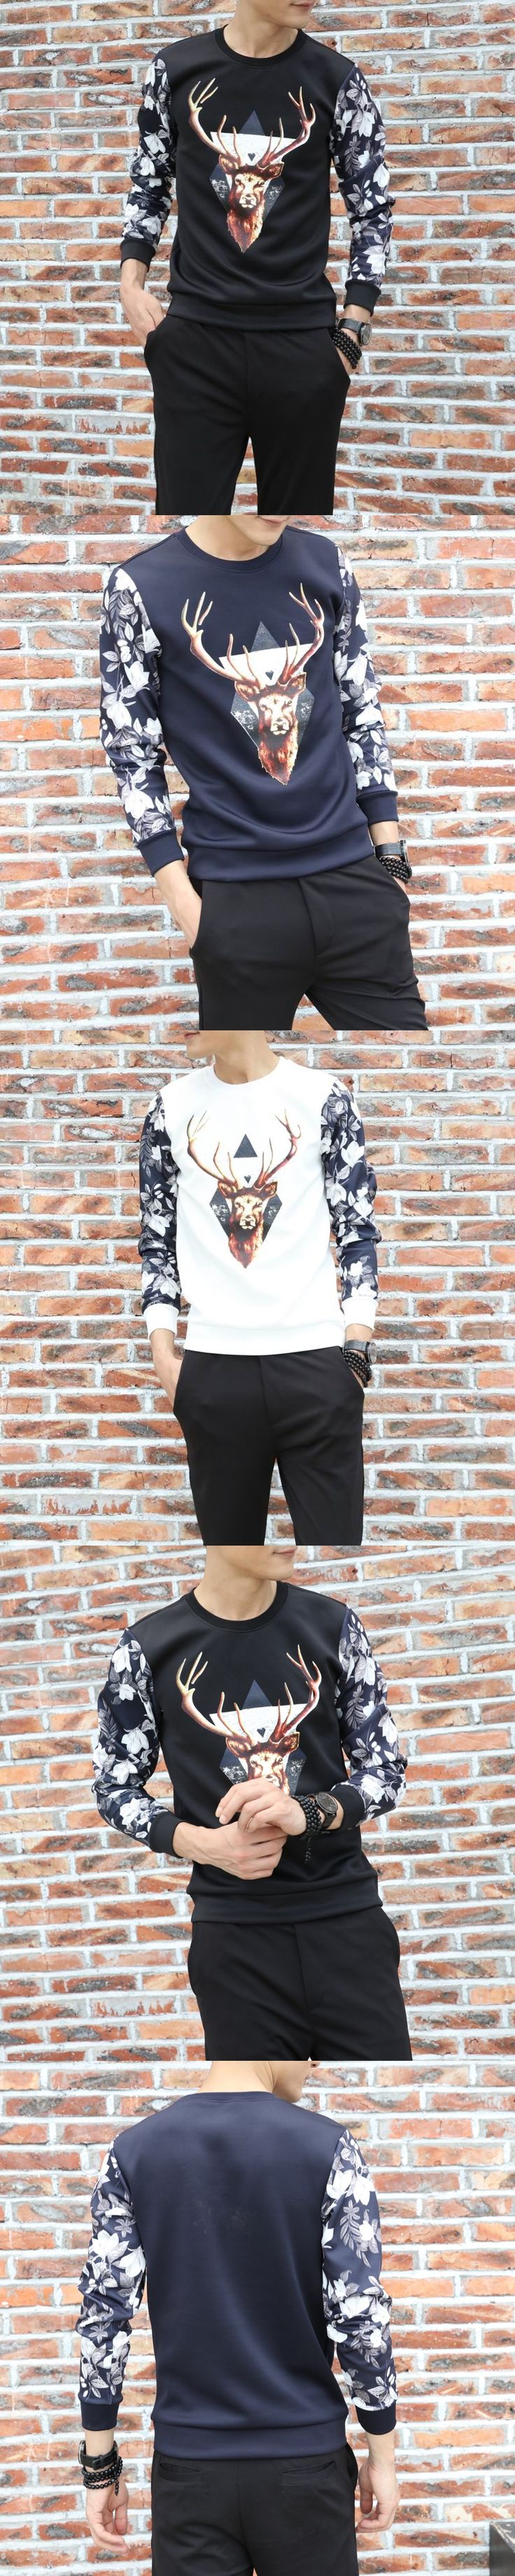 SHIFOPUTI Antumn O-neck 3D Printed Deer New Fashion Casual Long Sleeve Slim Men's Popular Brand Clothing High Quality T shirt